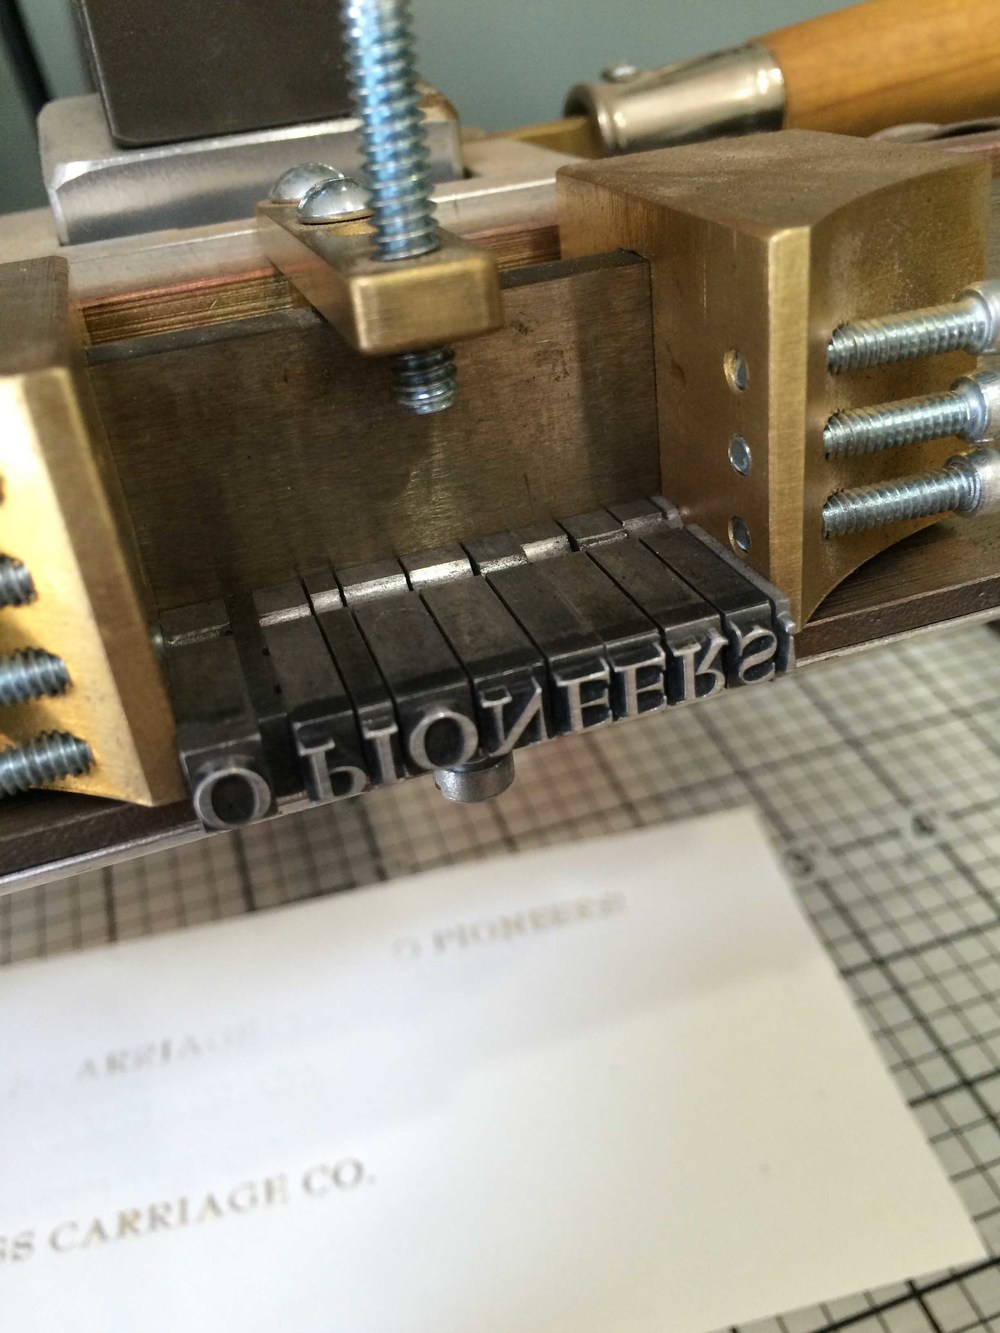 dski-design-o-pioneers-journal-9.jpg